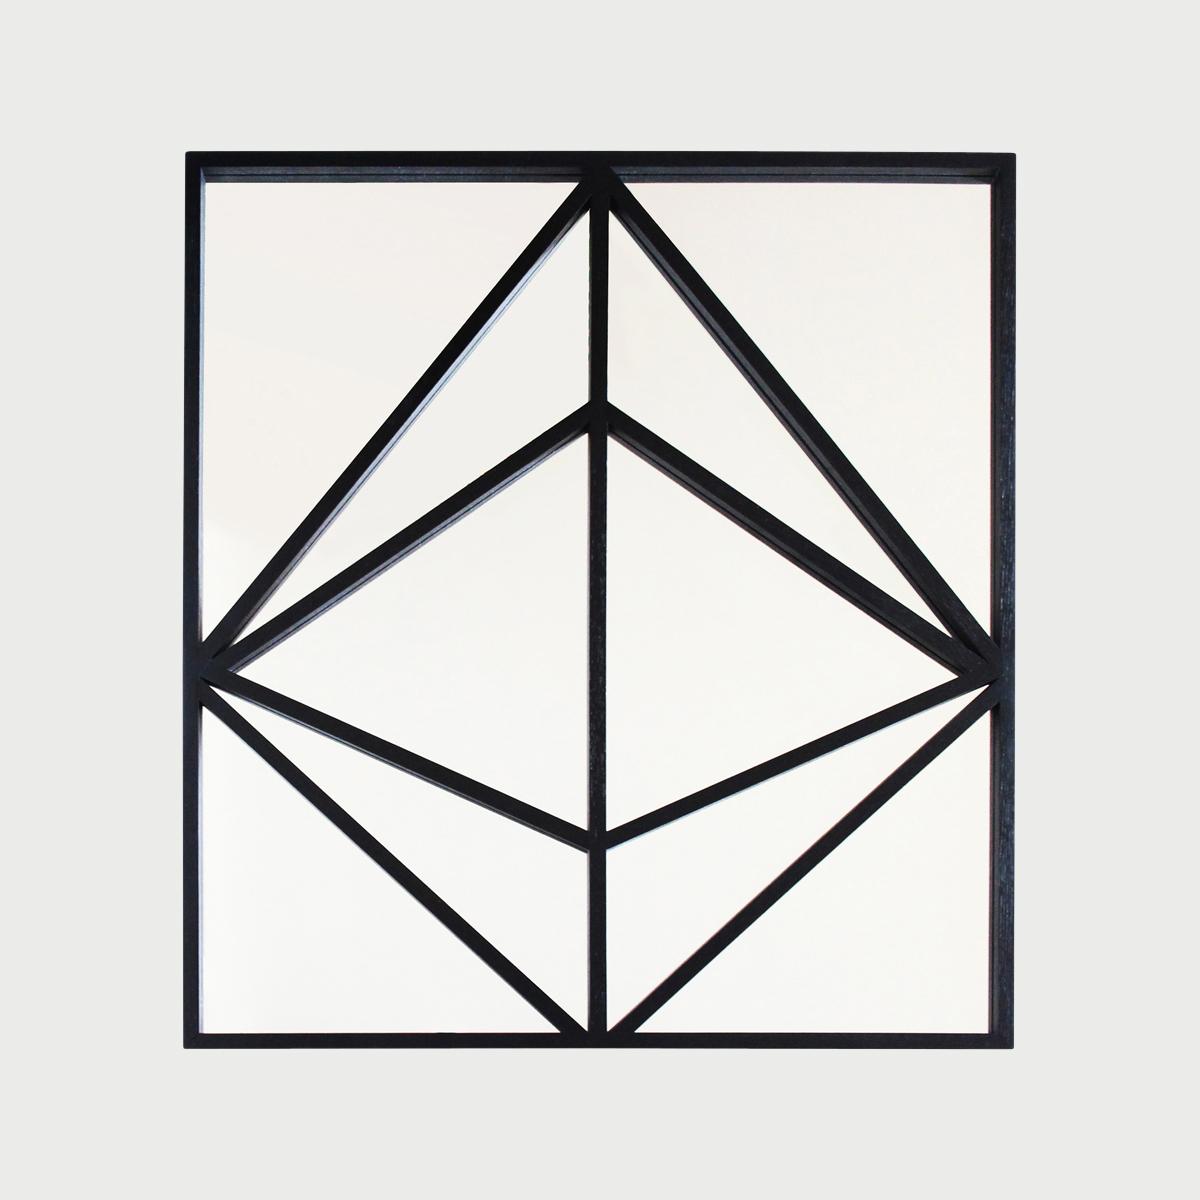 Prism mirror cover